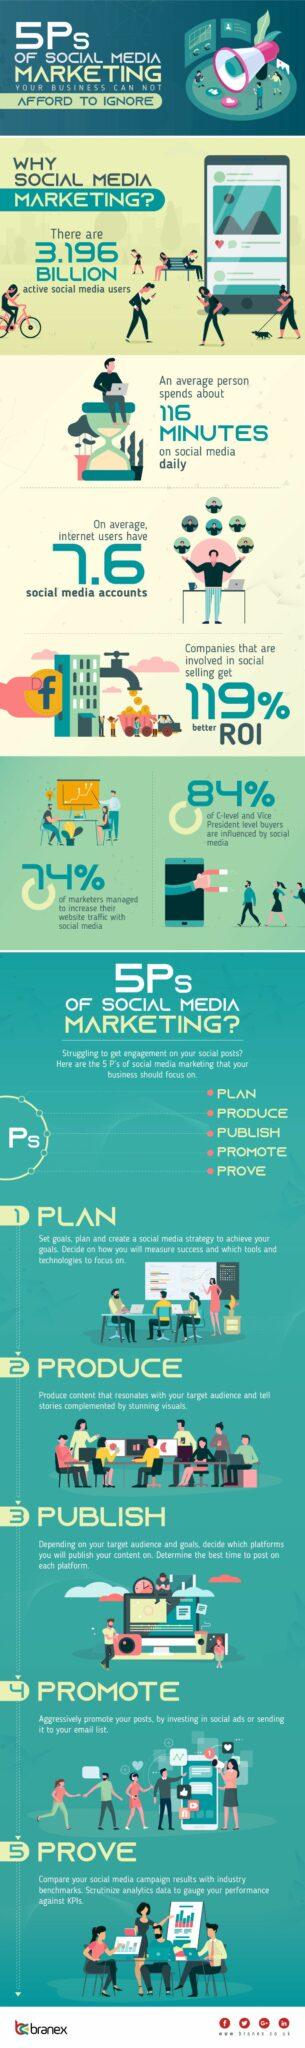 The 5 p's of social media marketing: plan, produce, publish, promote, prove